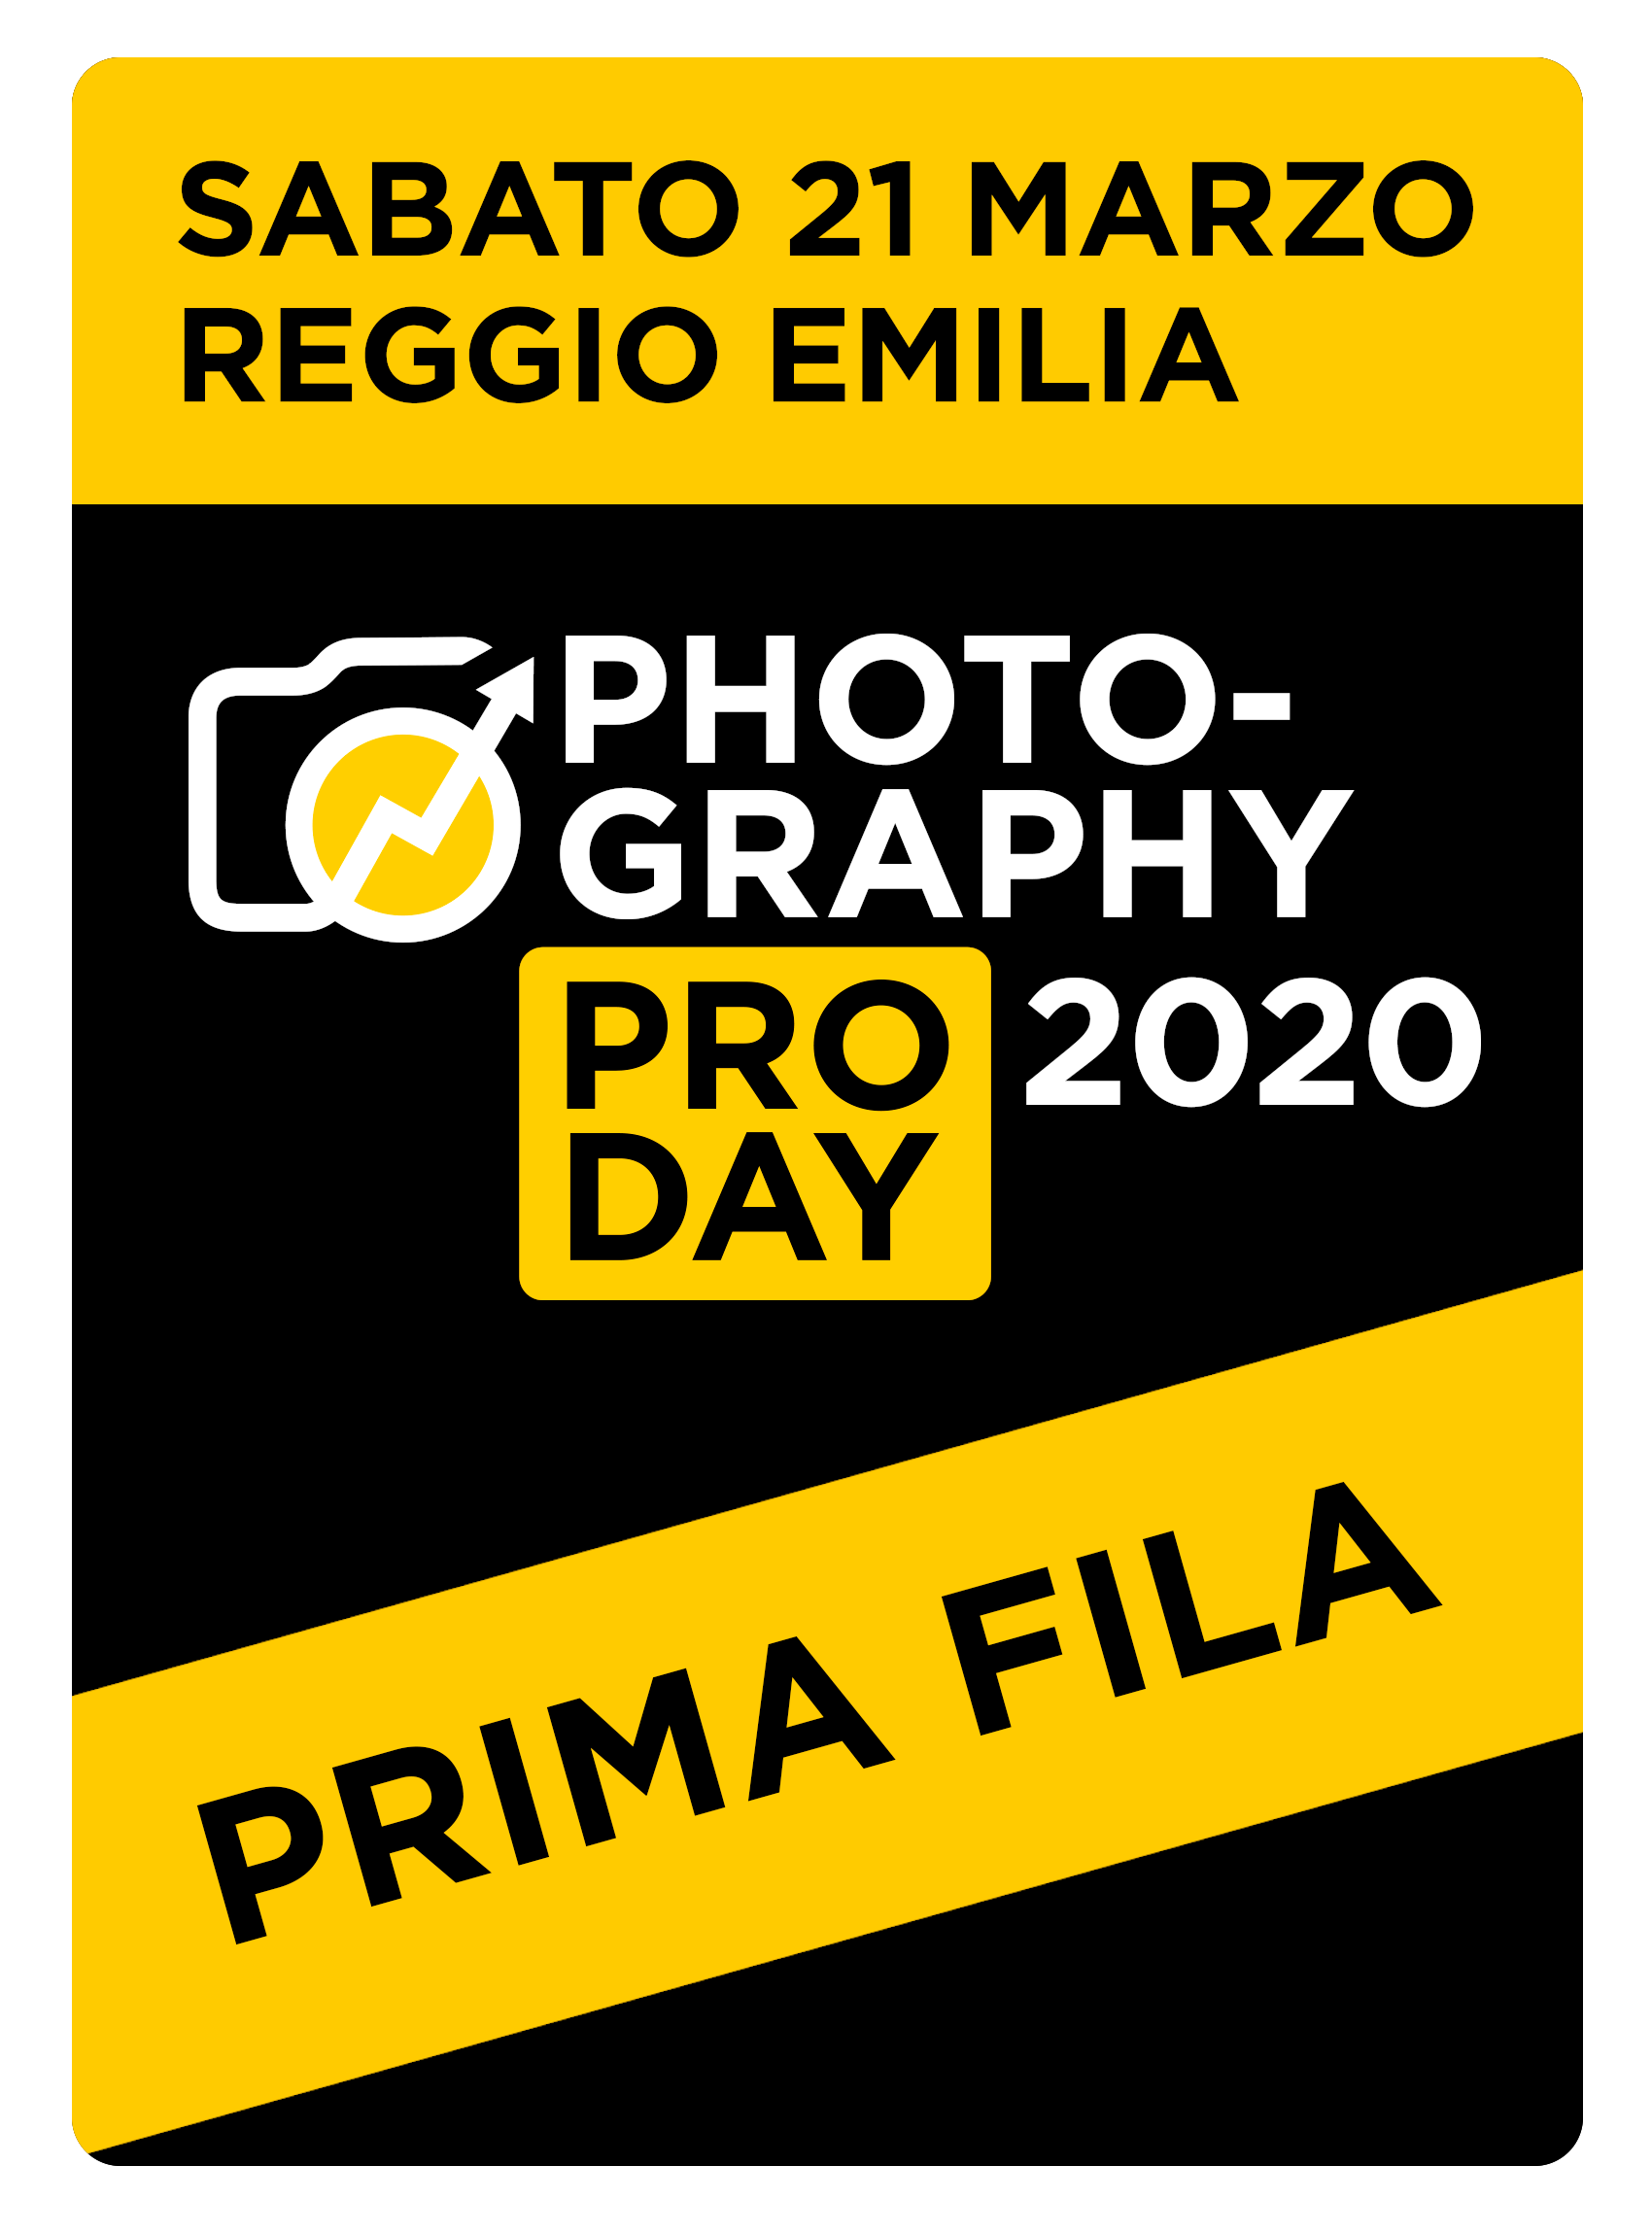 Photography PRO Day 2020 - Prima Fila